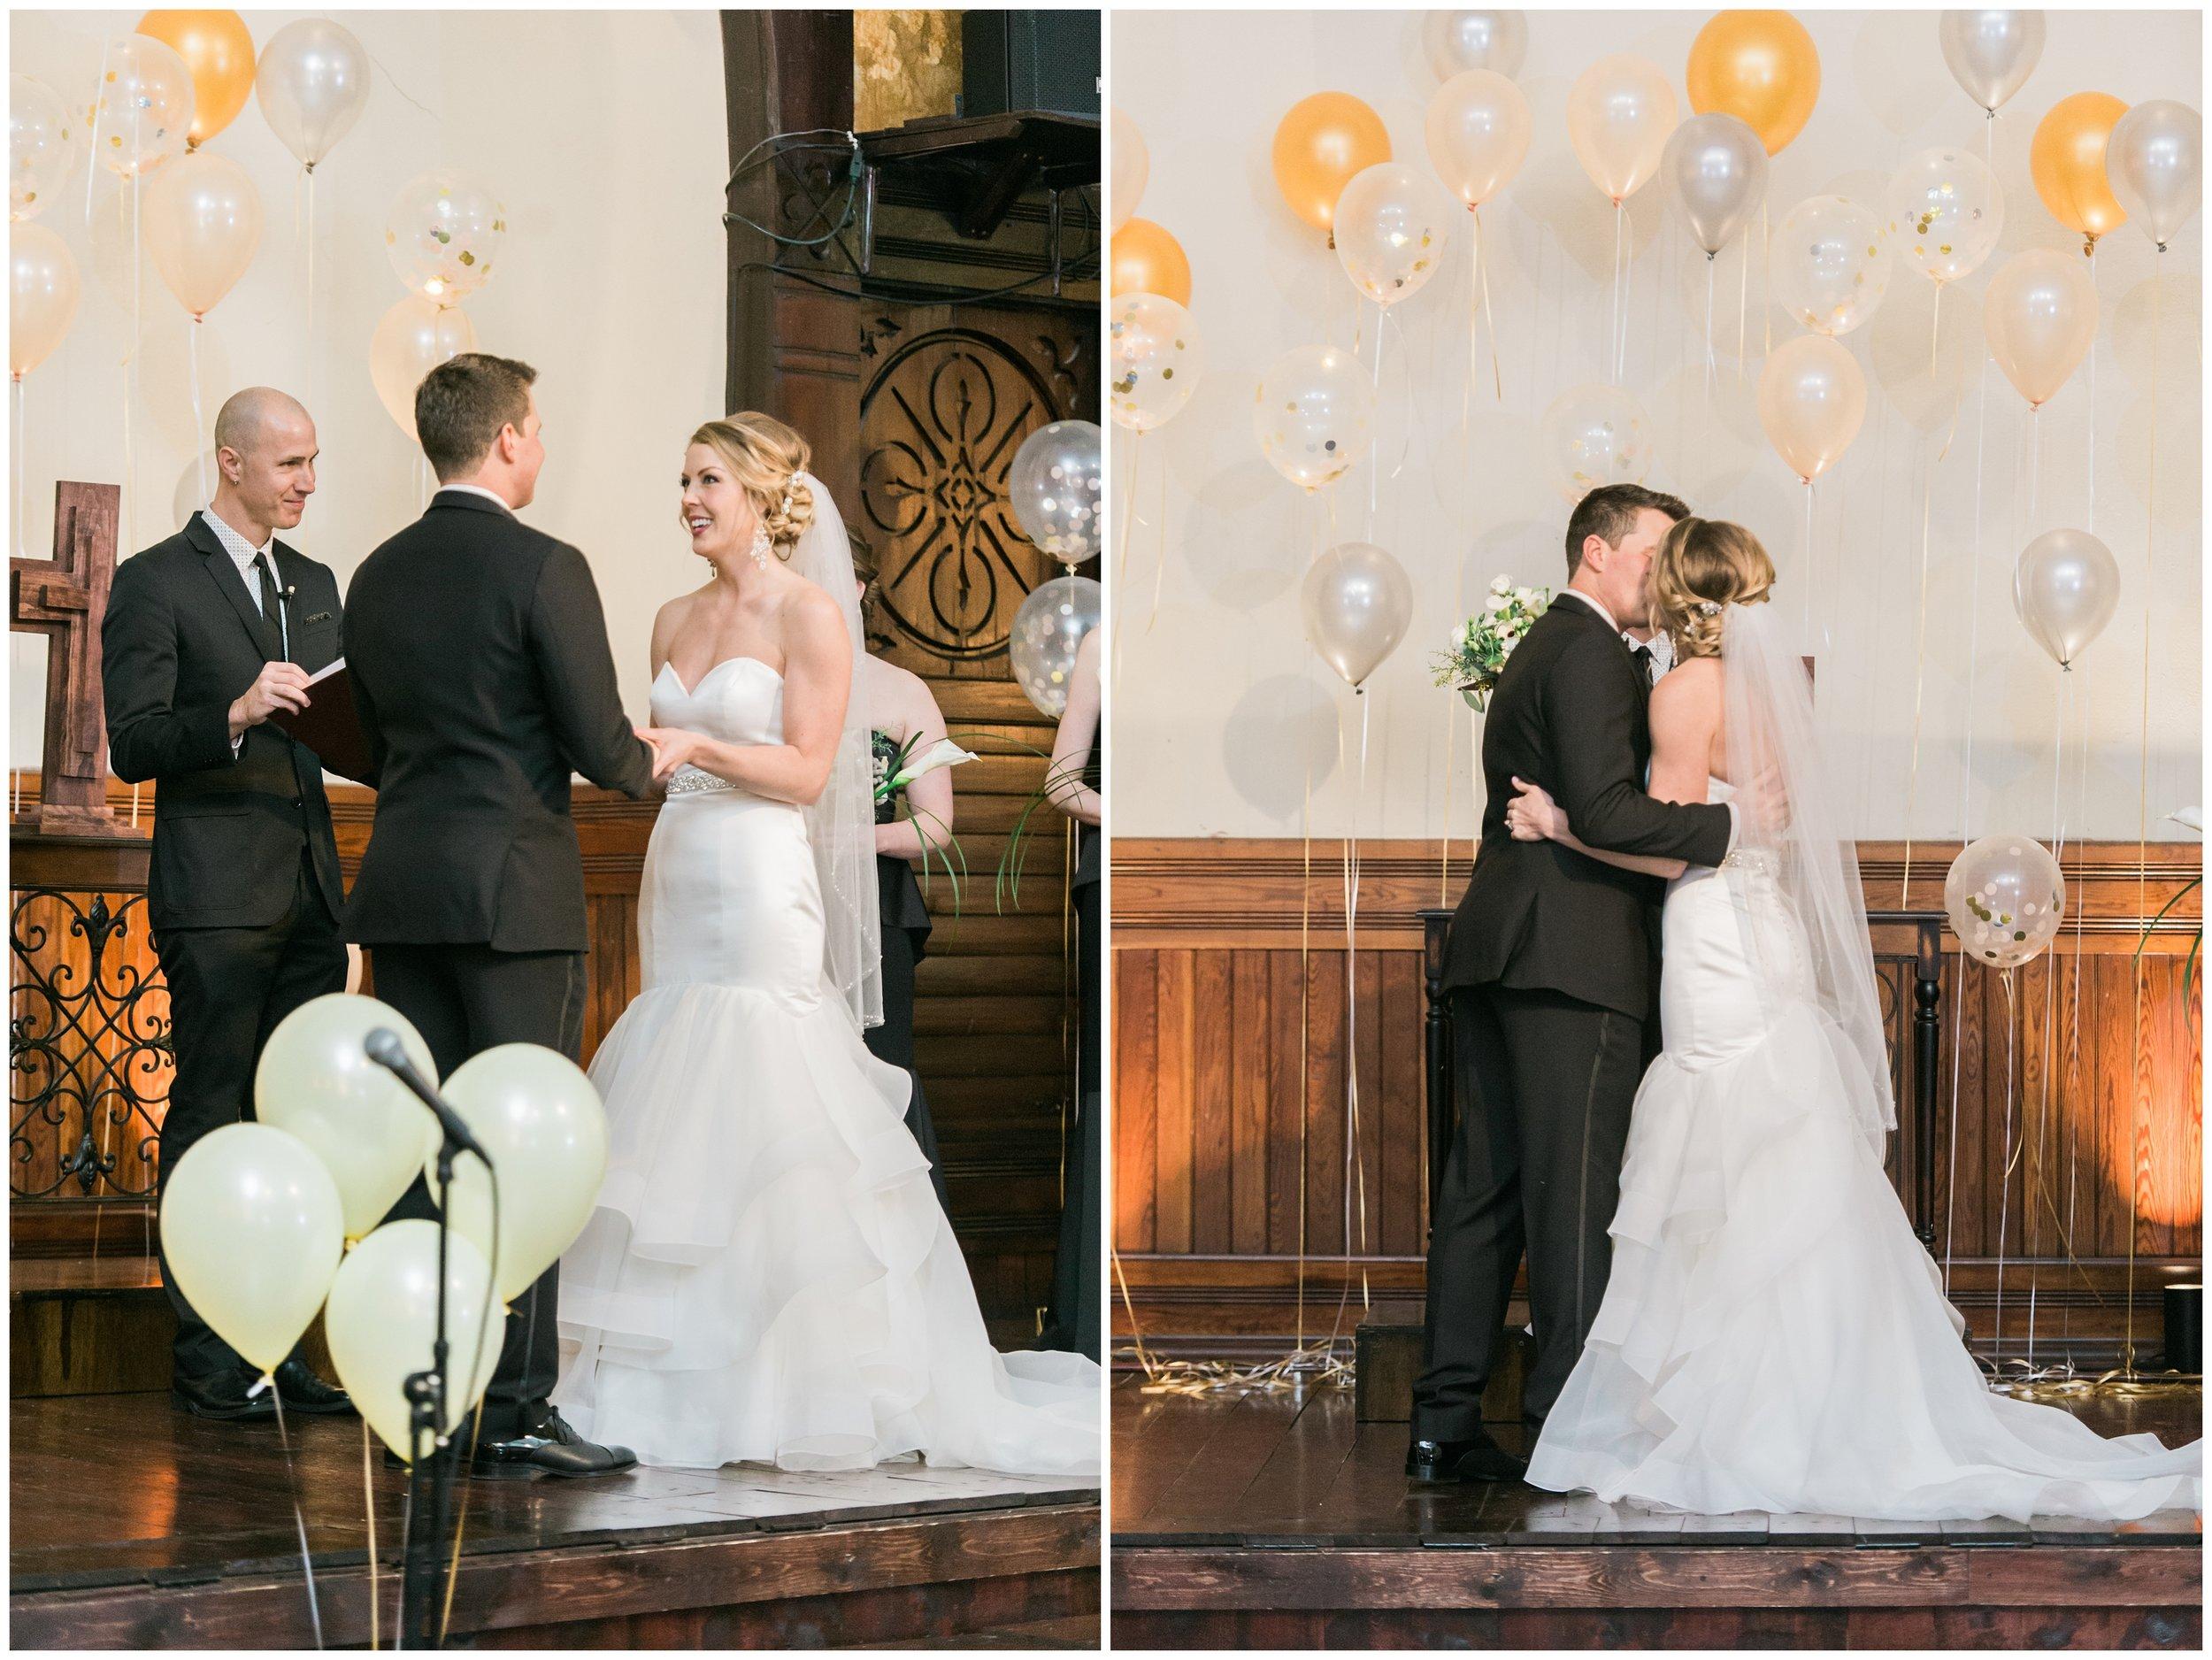 Rebecca_Bridges_Photography_Indianapolis_Wedding_Photographer_5834.jpg